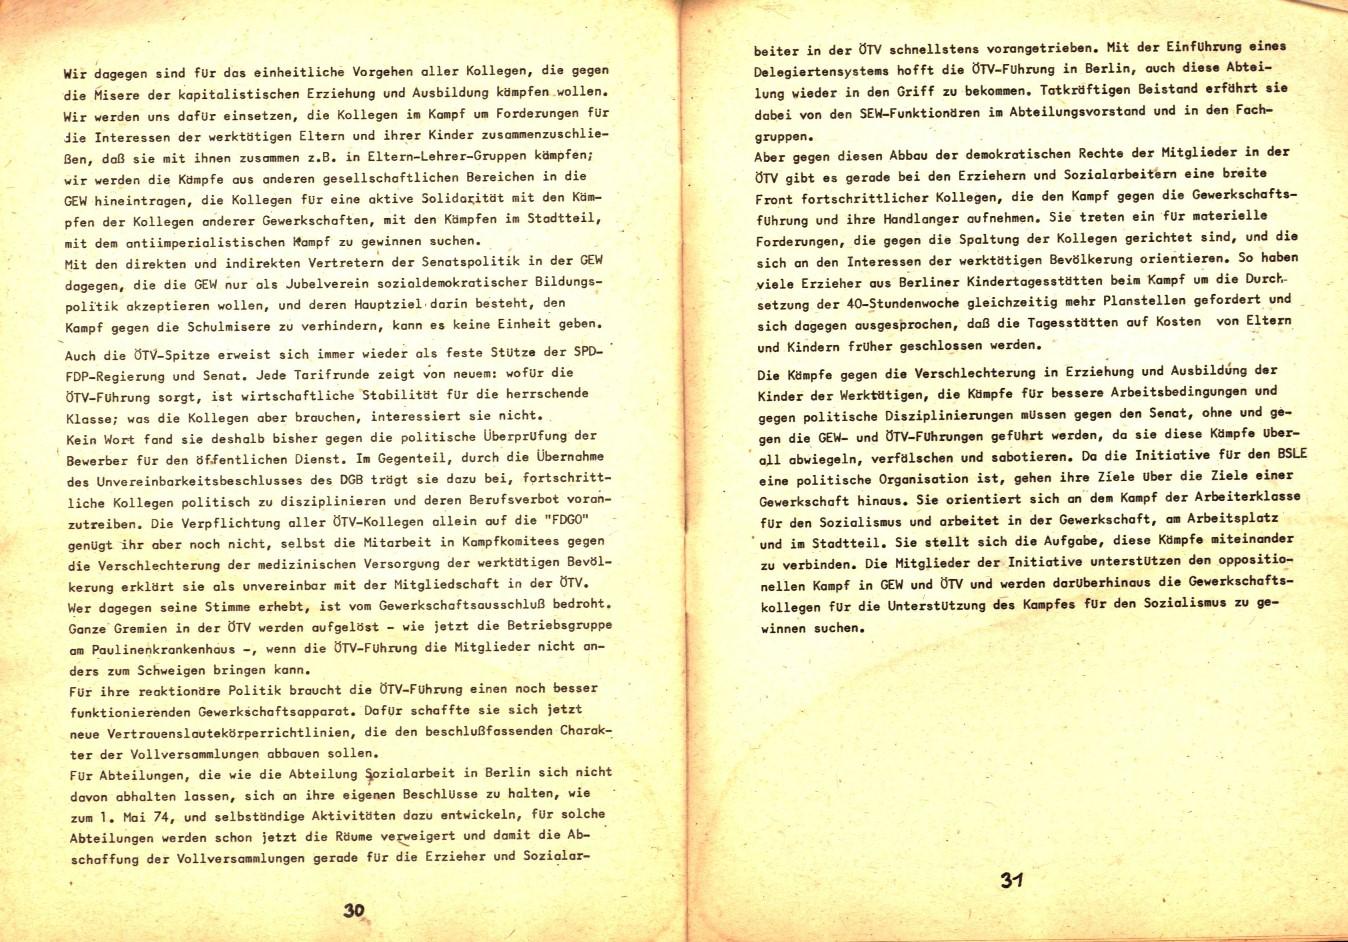 Berlin_BSLE_1975_Grundlagenpapier_17